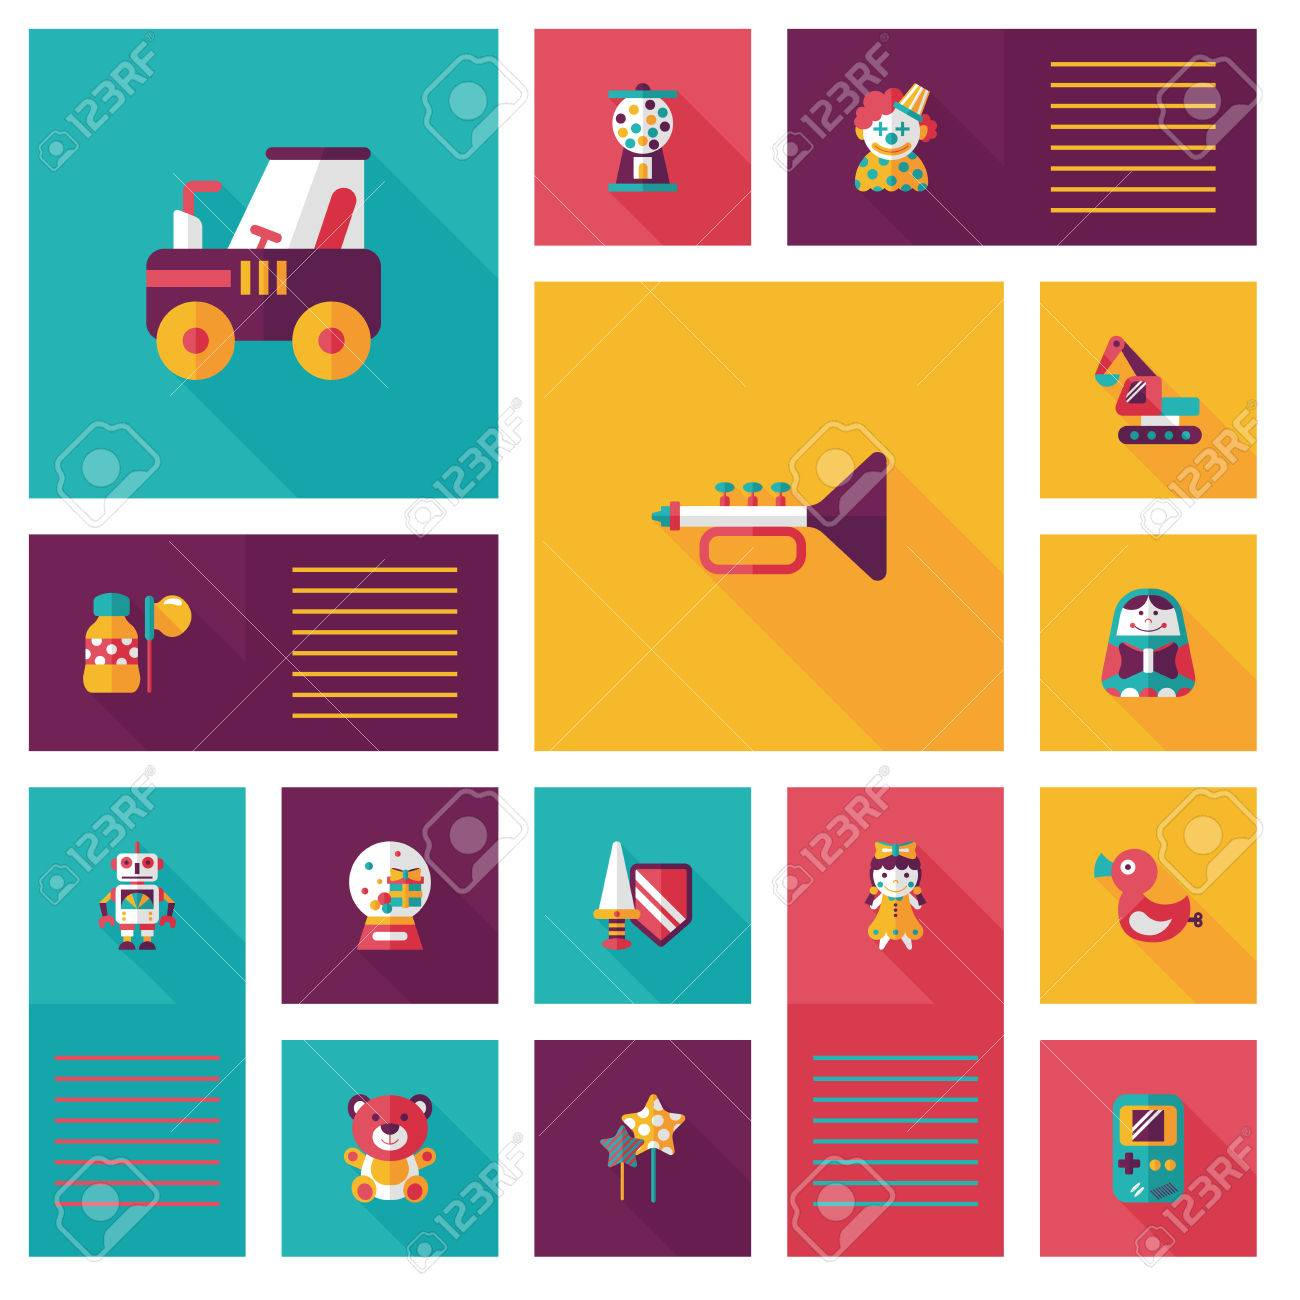 kid toys flat app ui background,eps10 - 31674630